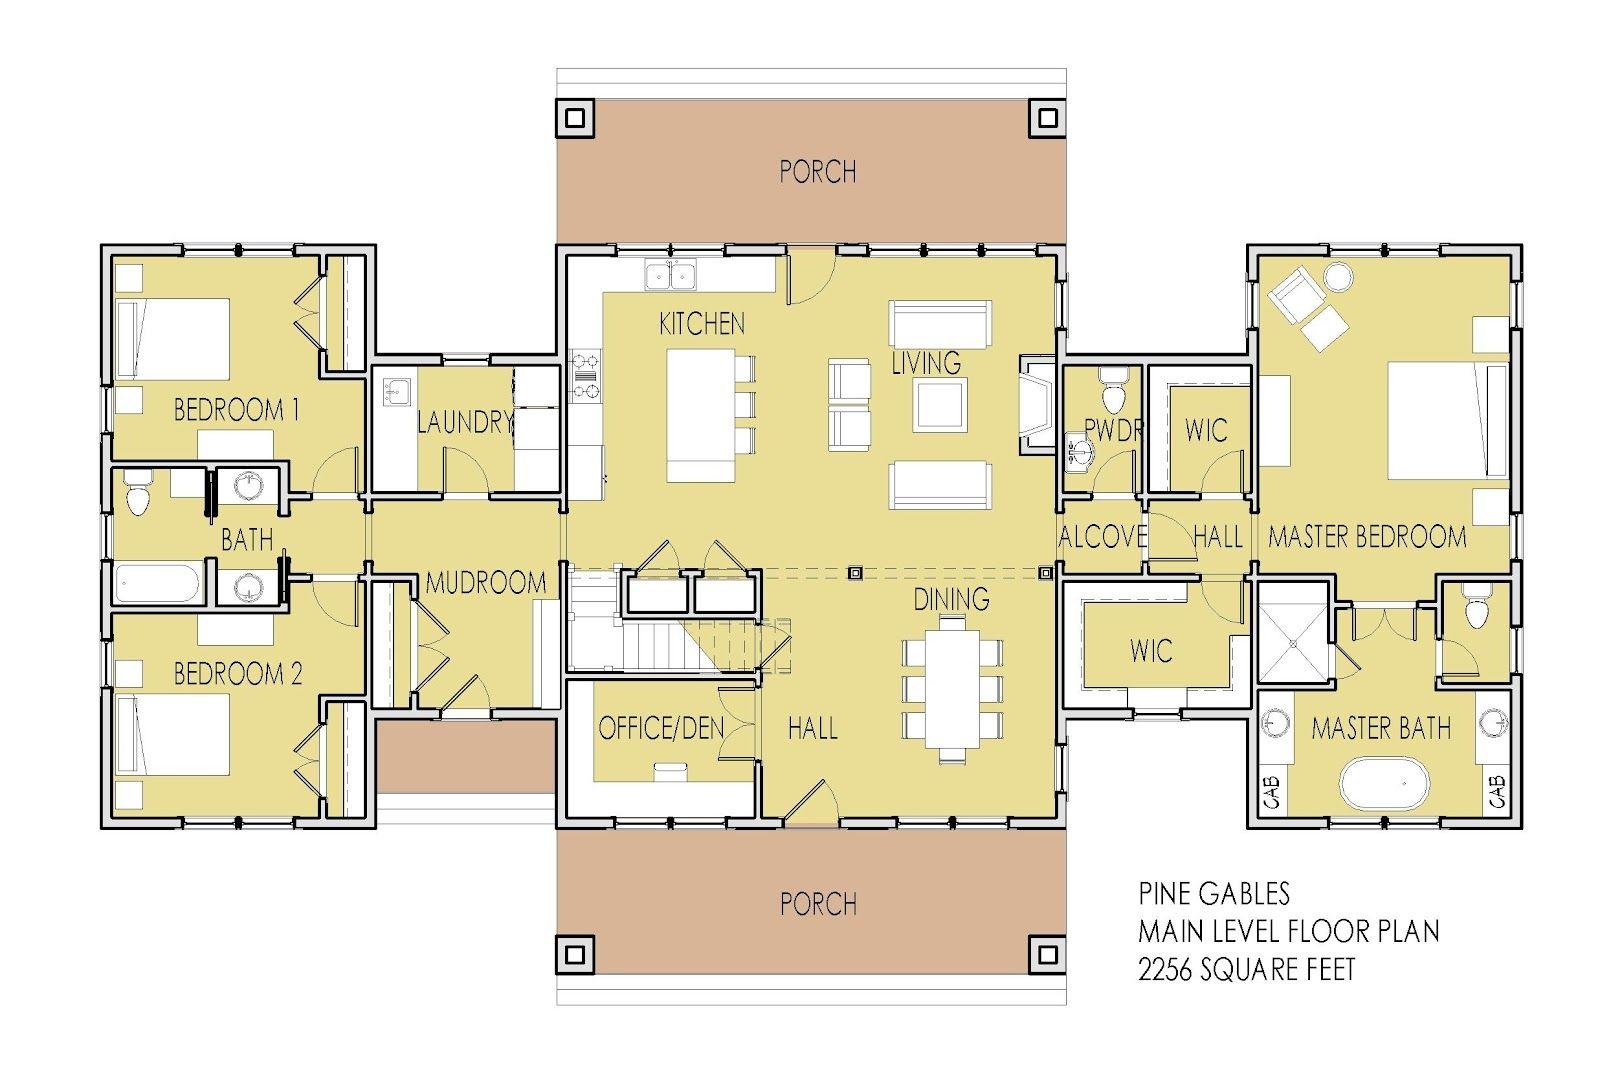 Single Story Dual Master Suite Floor Plans Open Floor House Plans New House Plans Master Suite Floor Plan